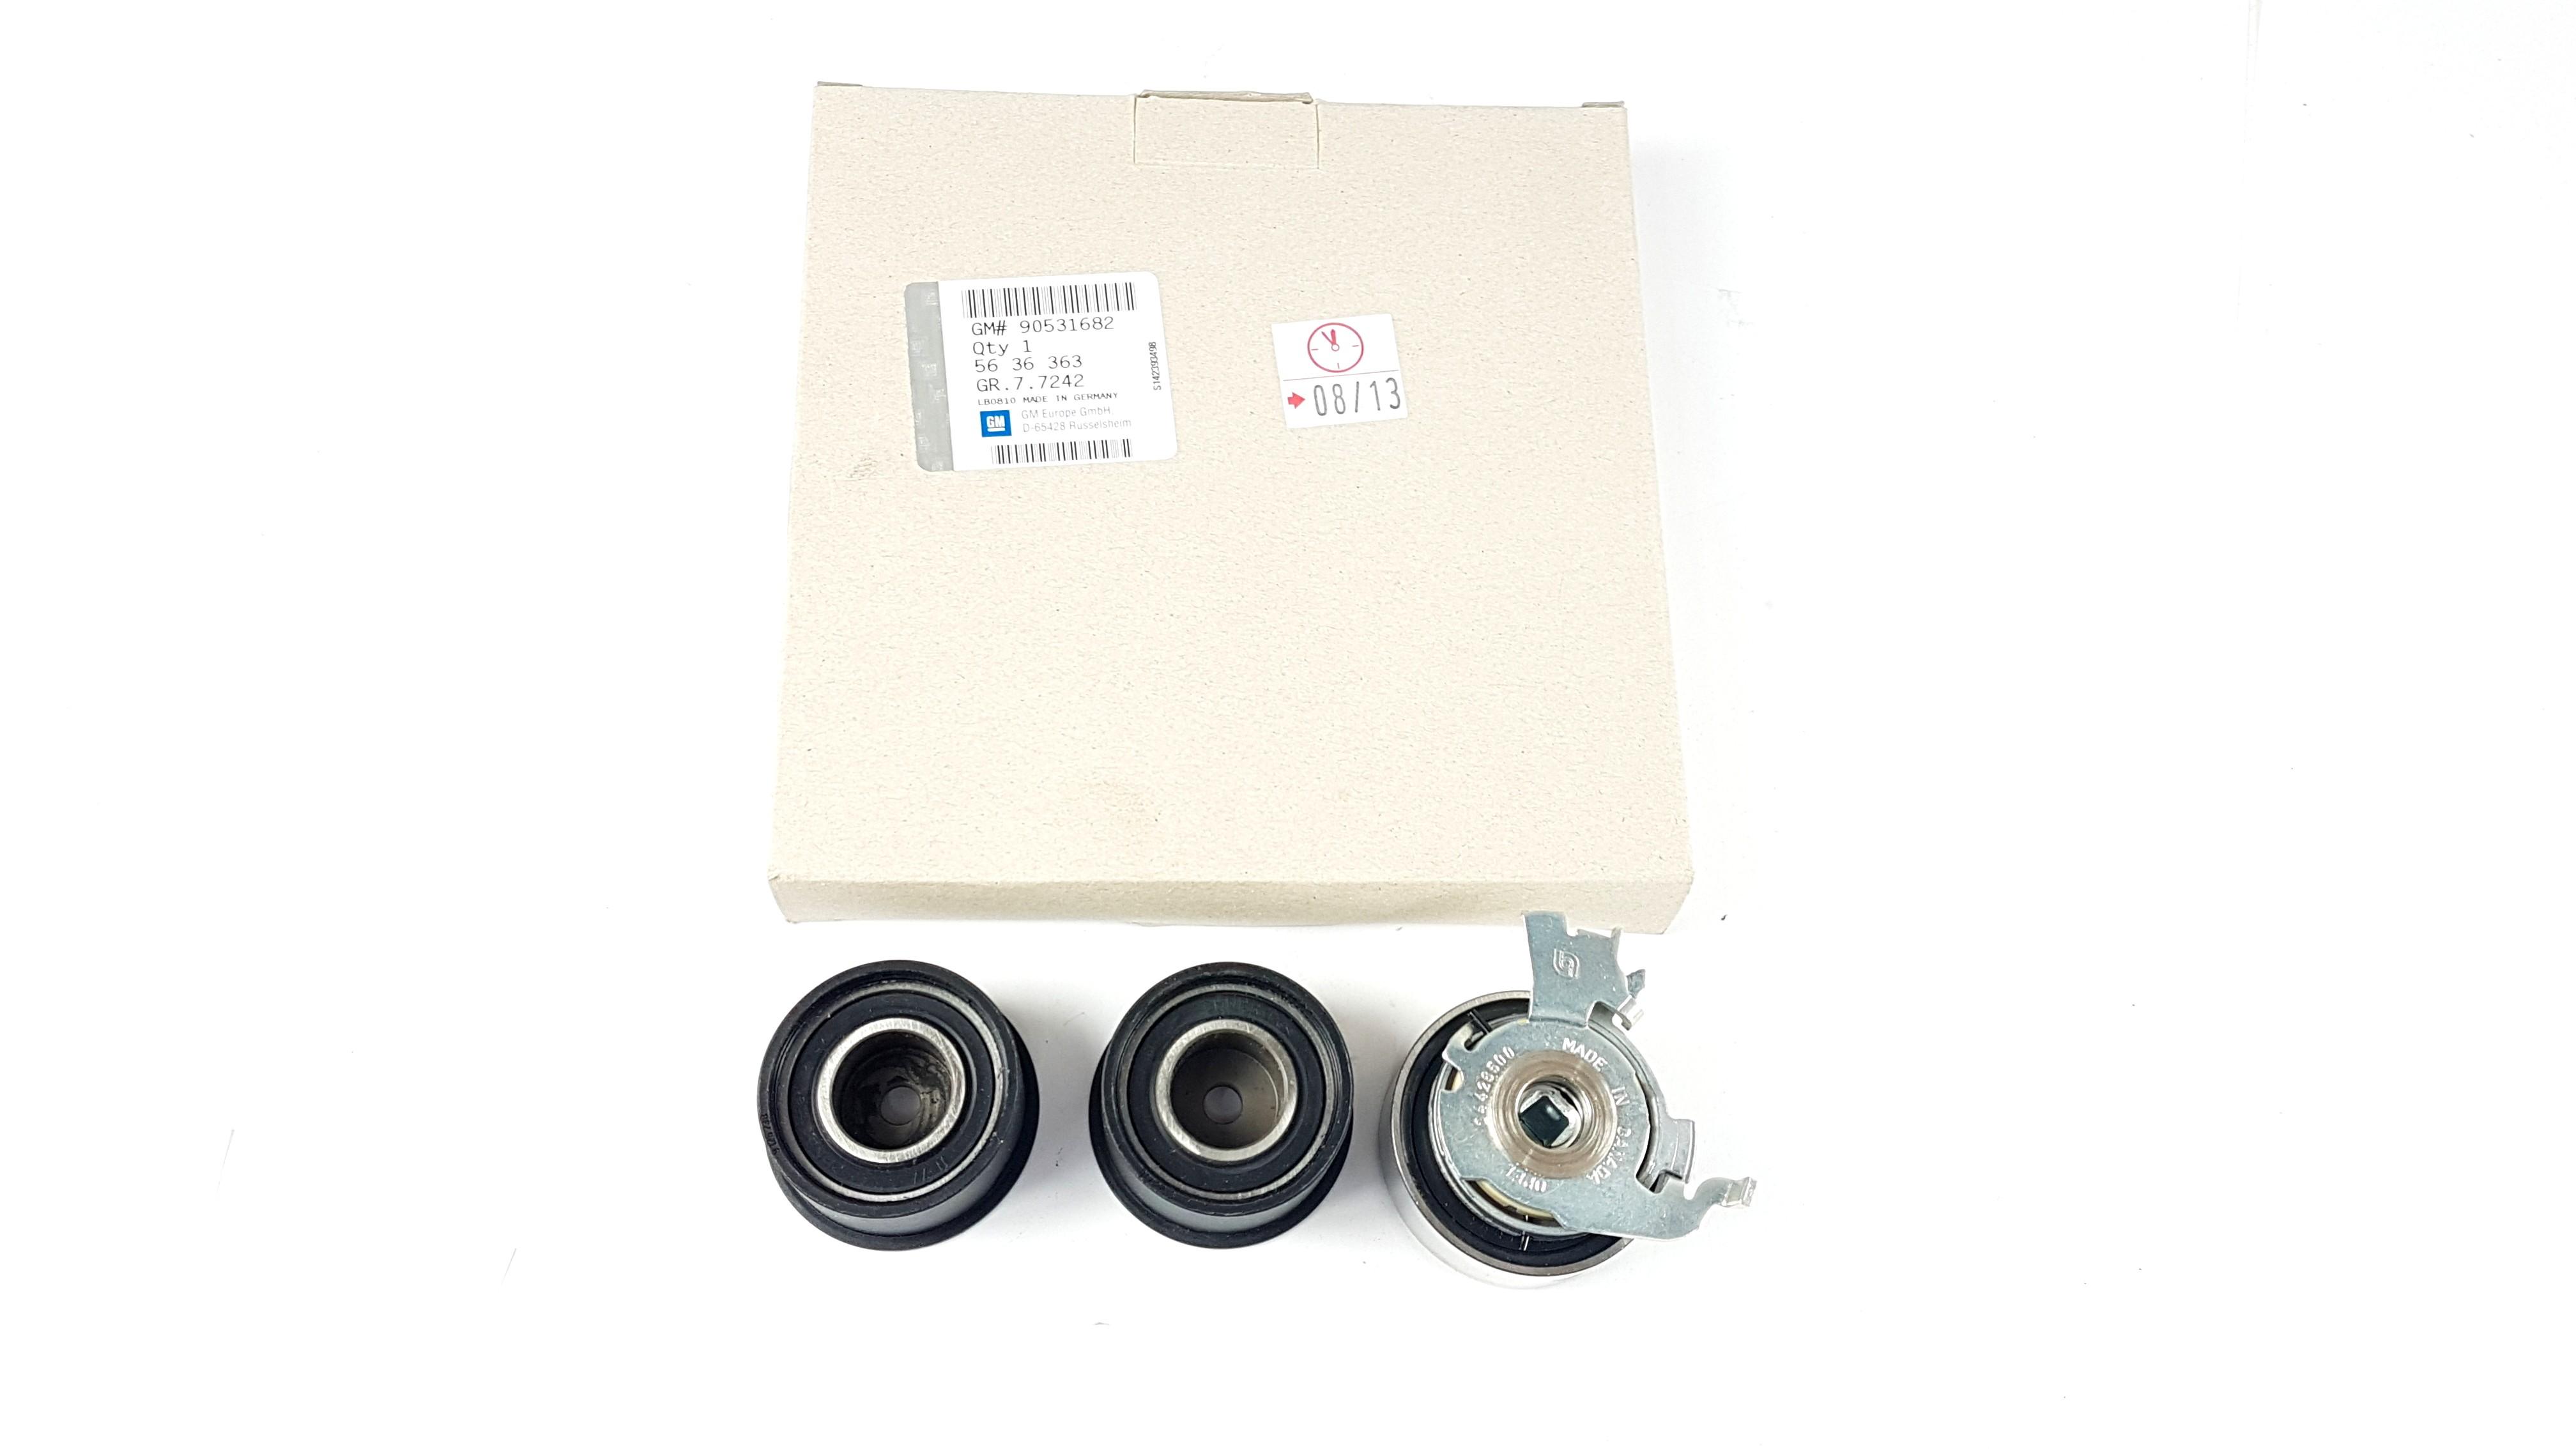 Genuine Gm 93174261 X18xe X20xev Vauxhall Calibra Omega Vectra B Opel Timing Belt Astra F Kit